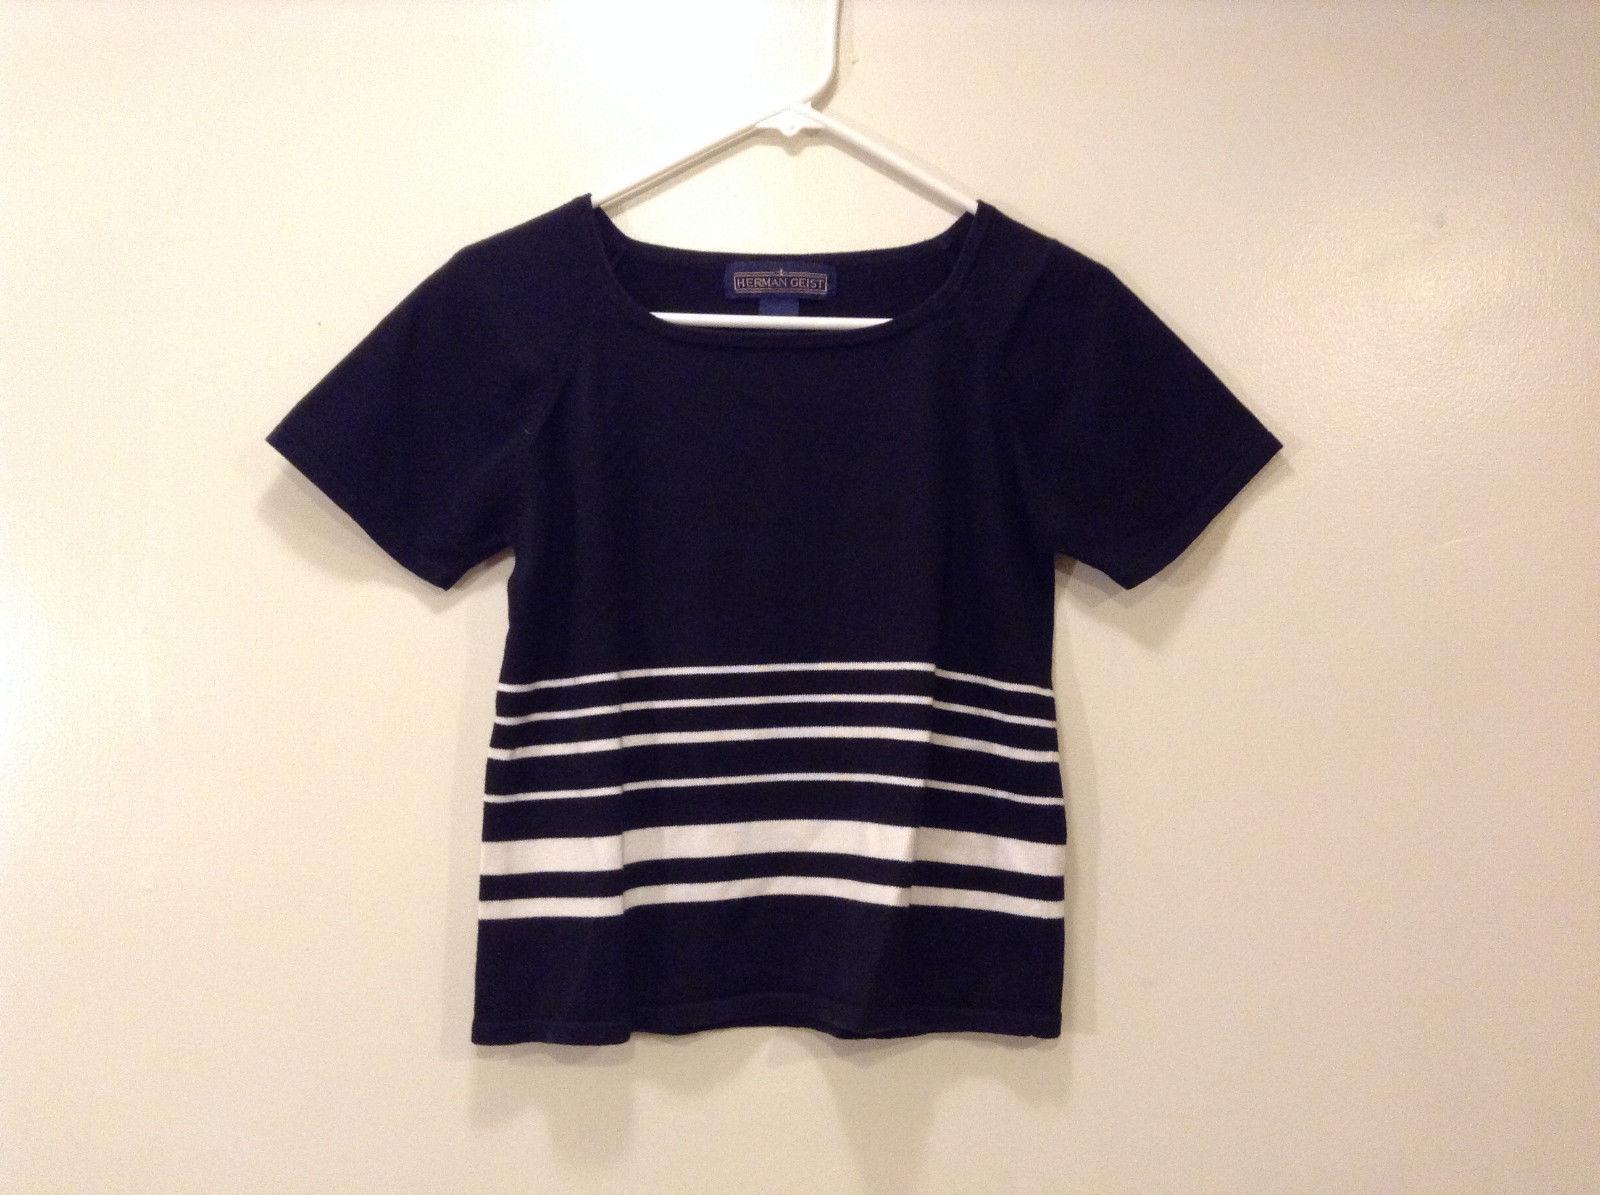 Herman Geist Ladies Striped Black White Blouse Top T-shirt, Size S Raglan sleeve